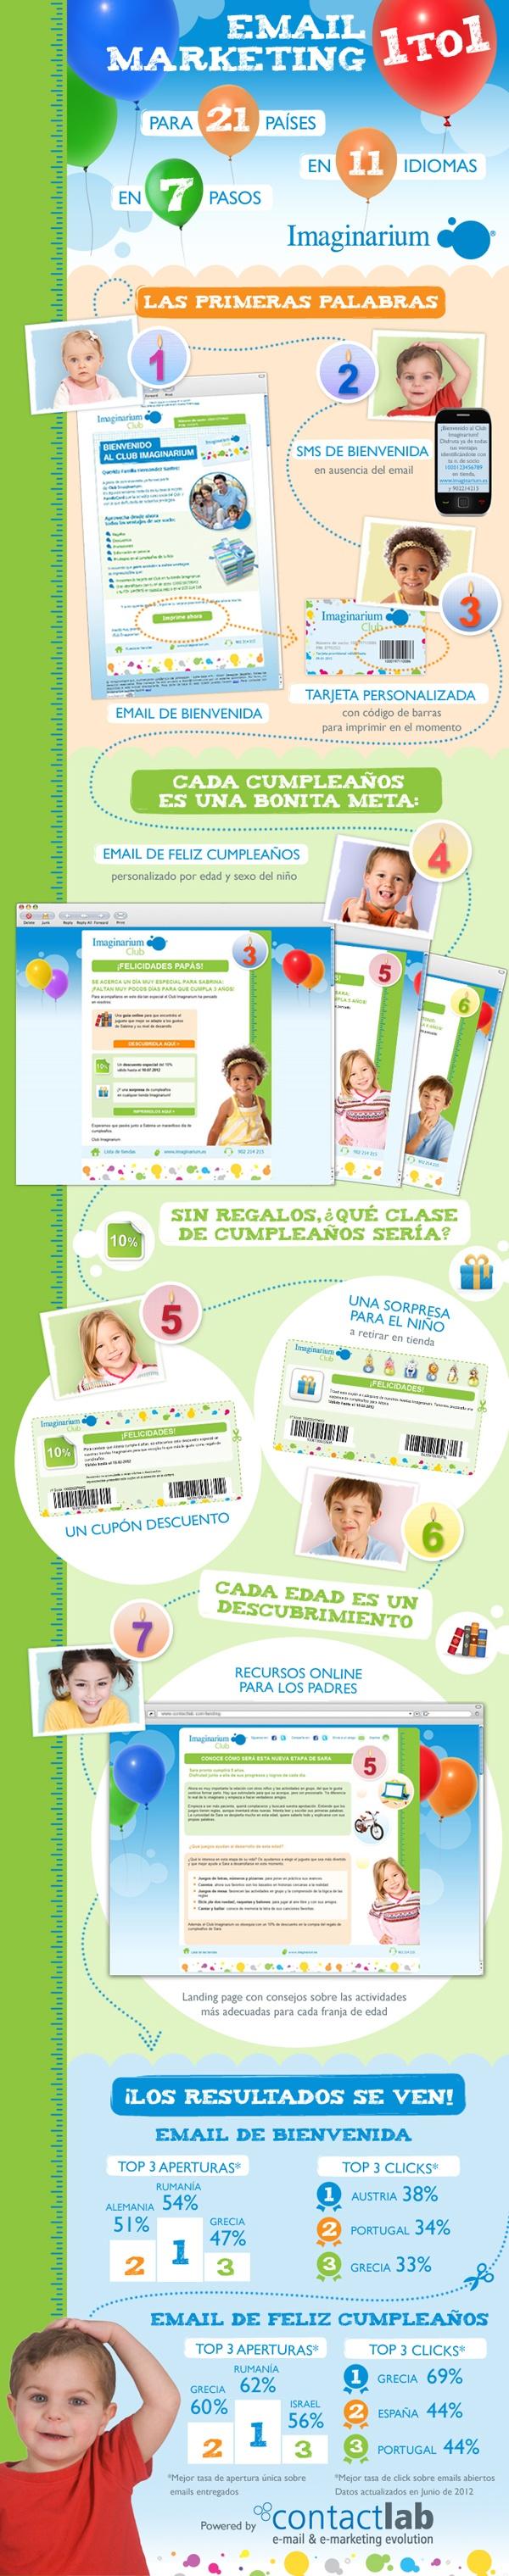 ContactLab para Imaginarium: email marketing 1 to 1